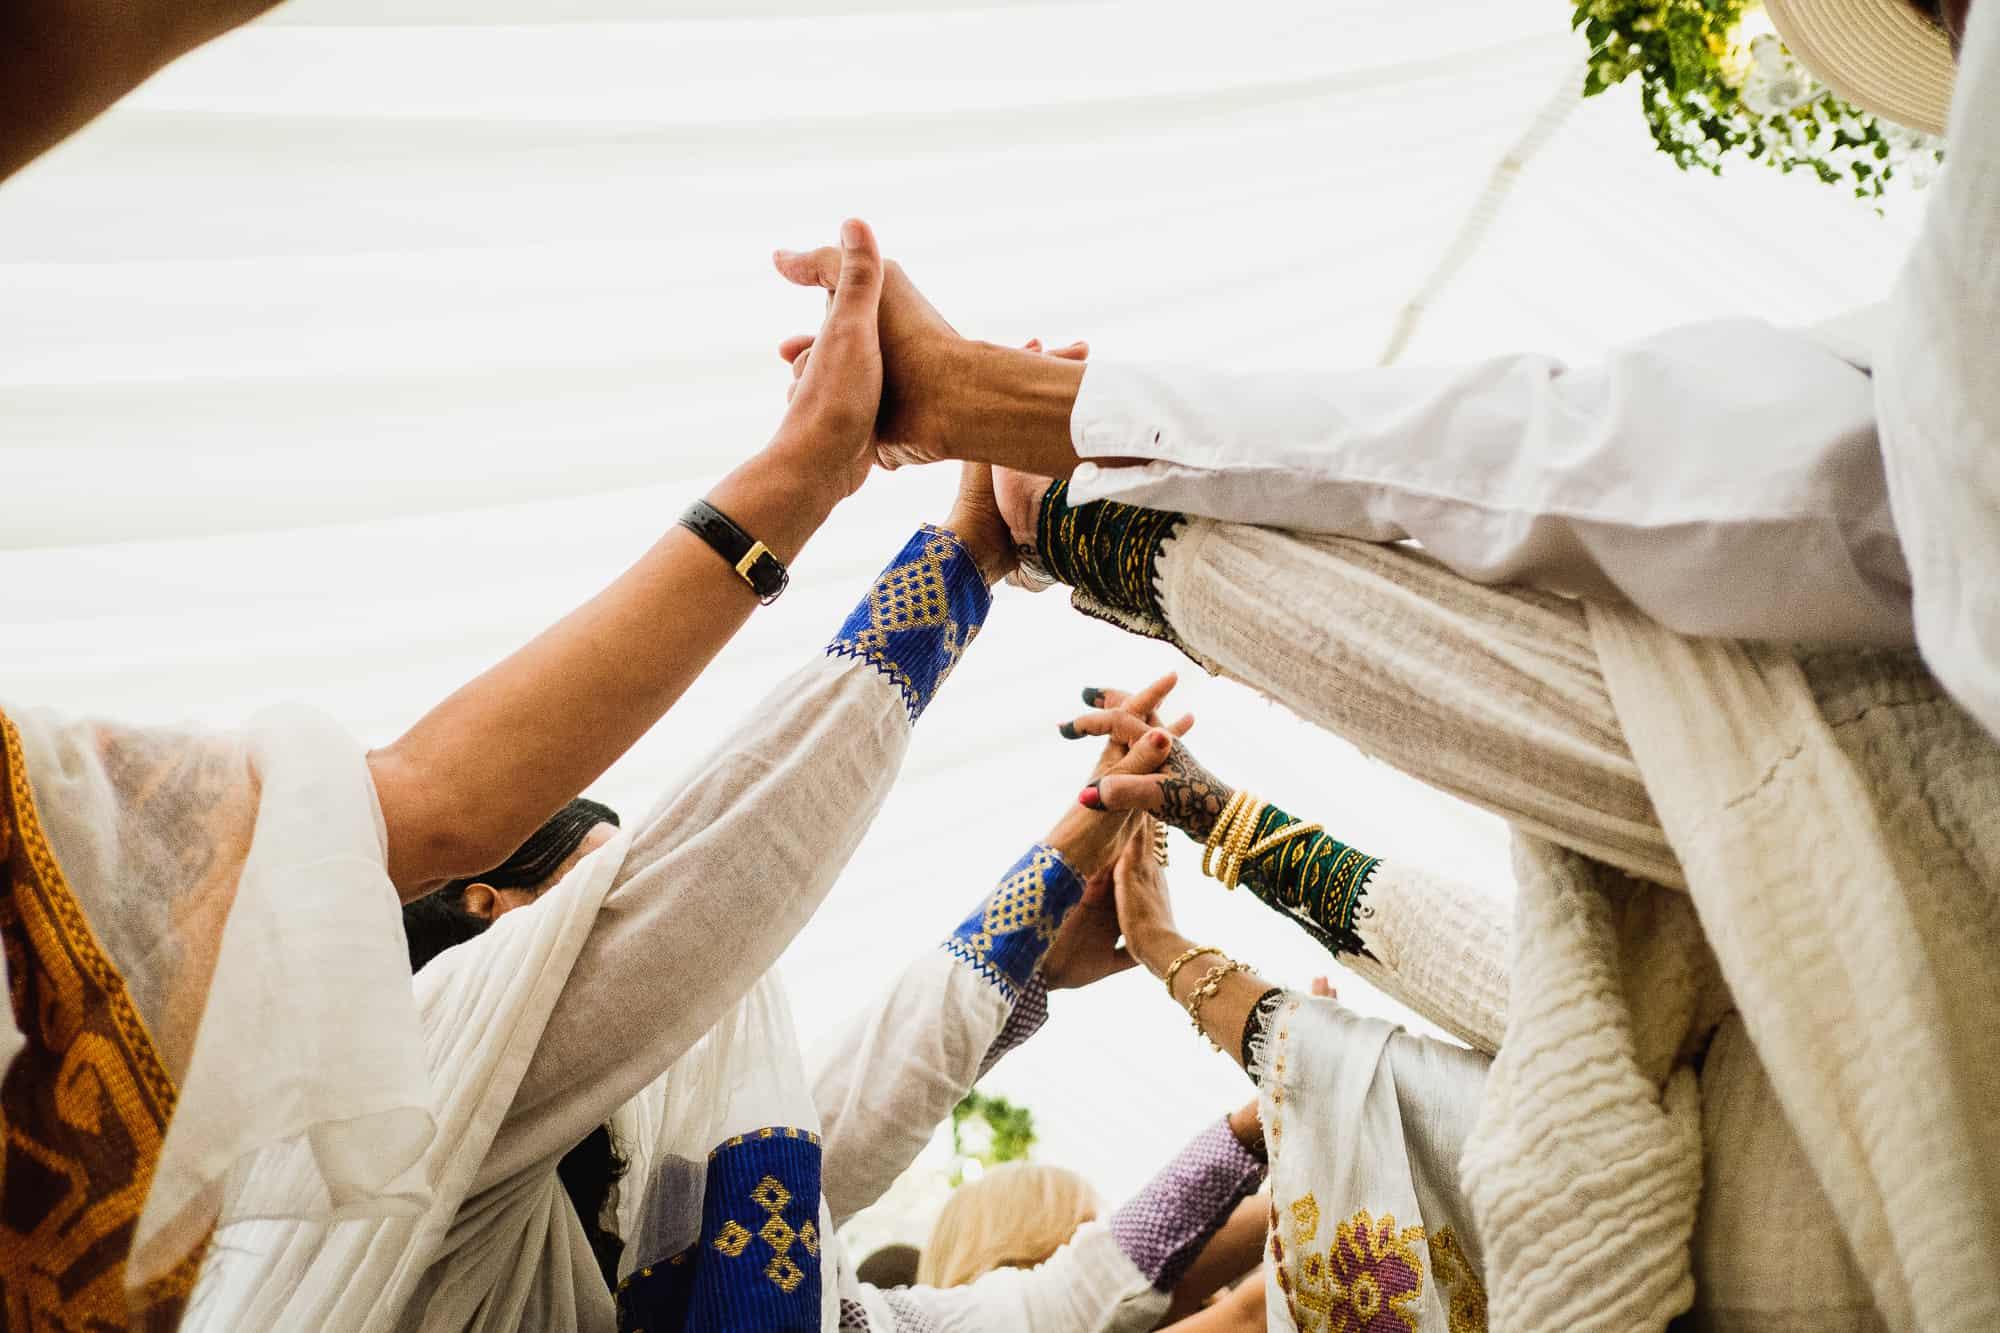 marleybrook-house-wedding-photography-matt-tyler-0045